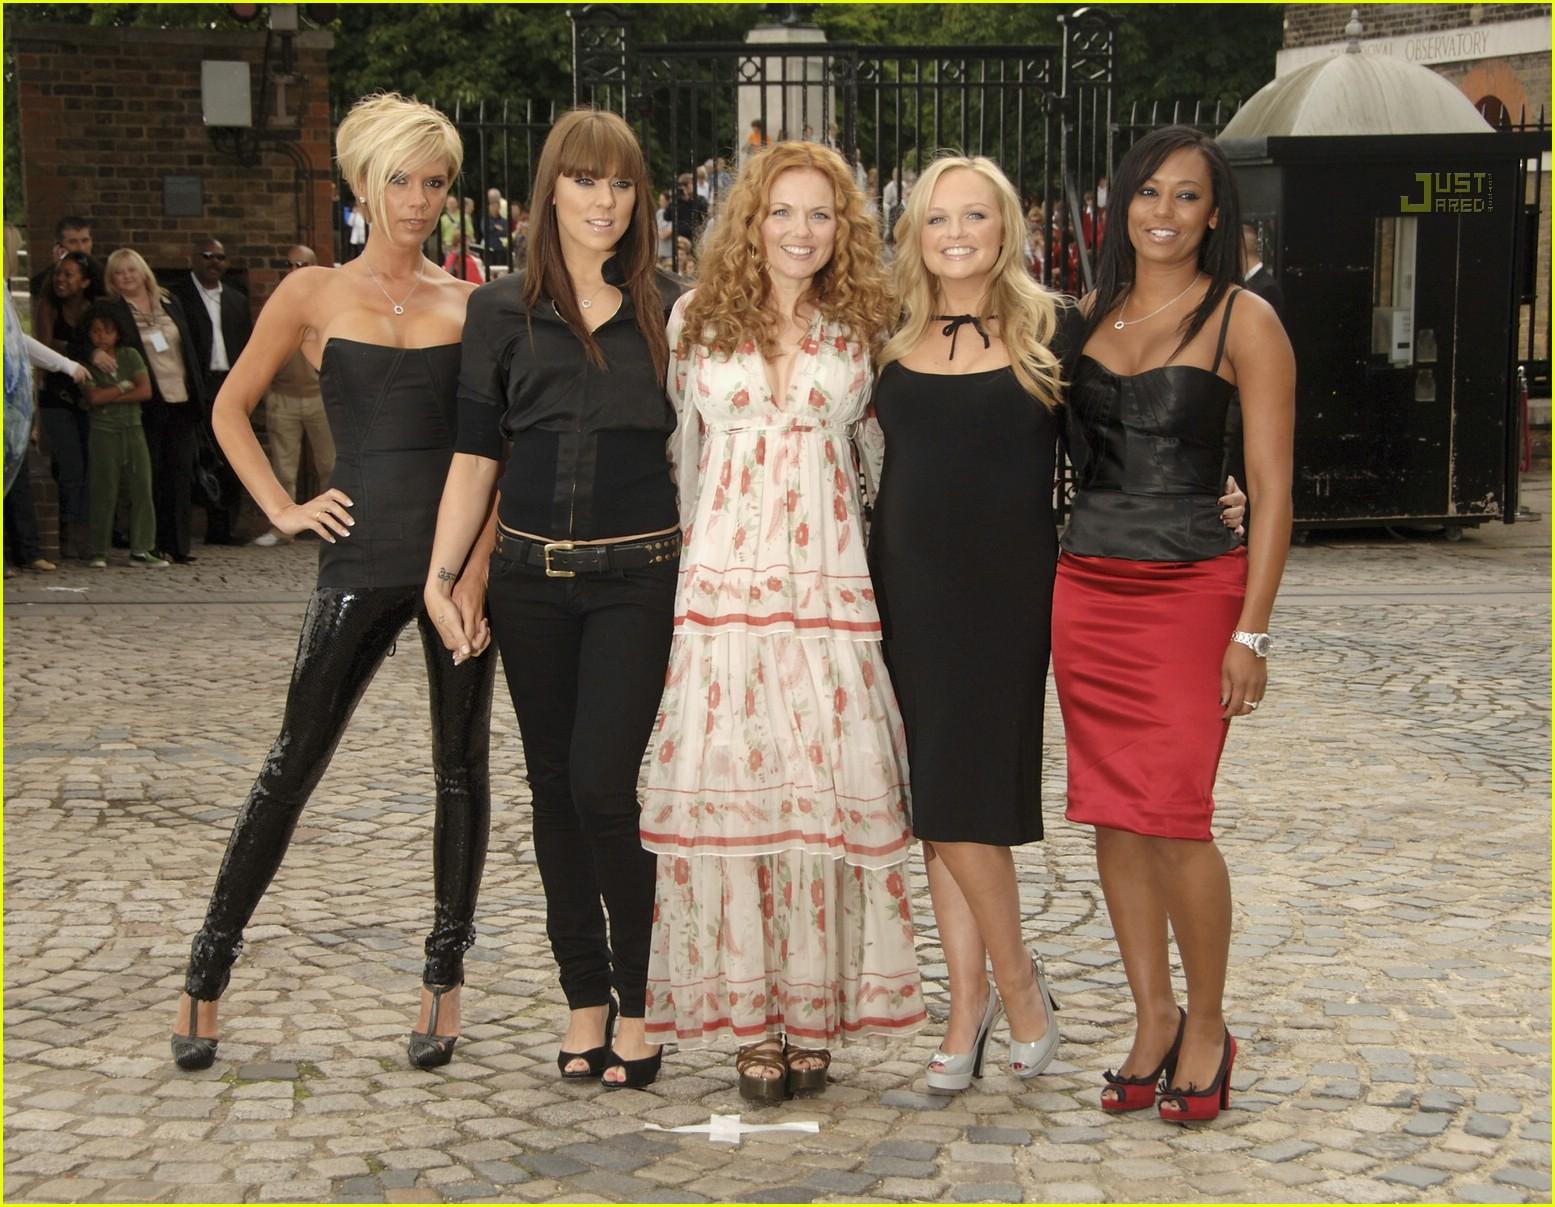 spice-girls-headlines-greatest-hits-reunion-2007